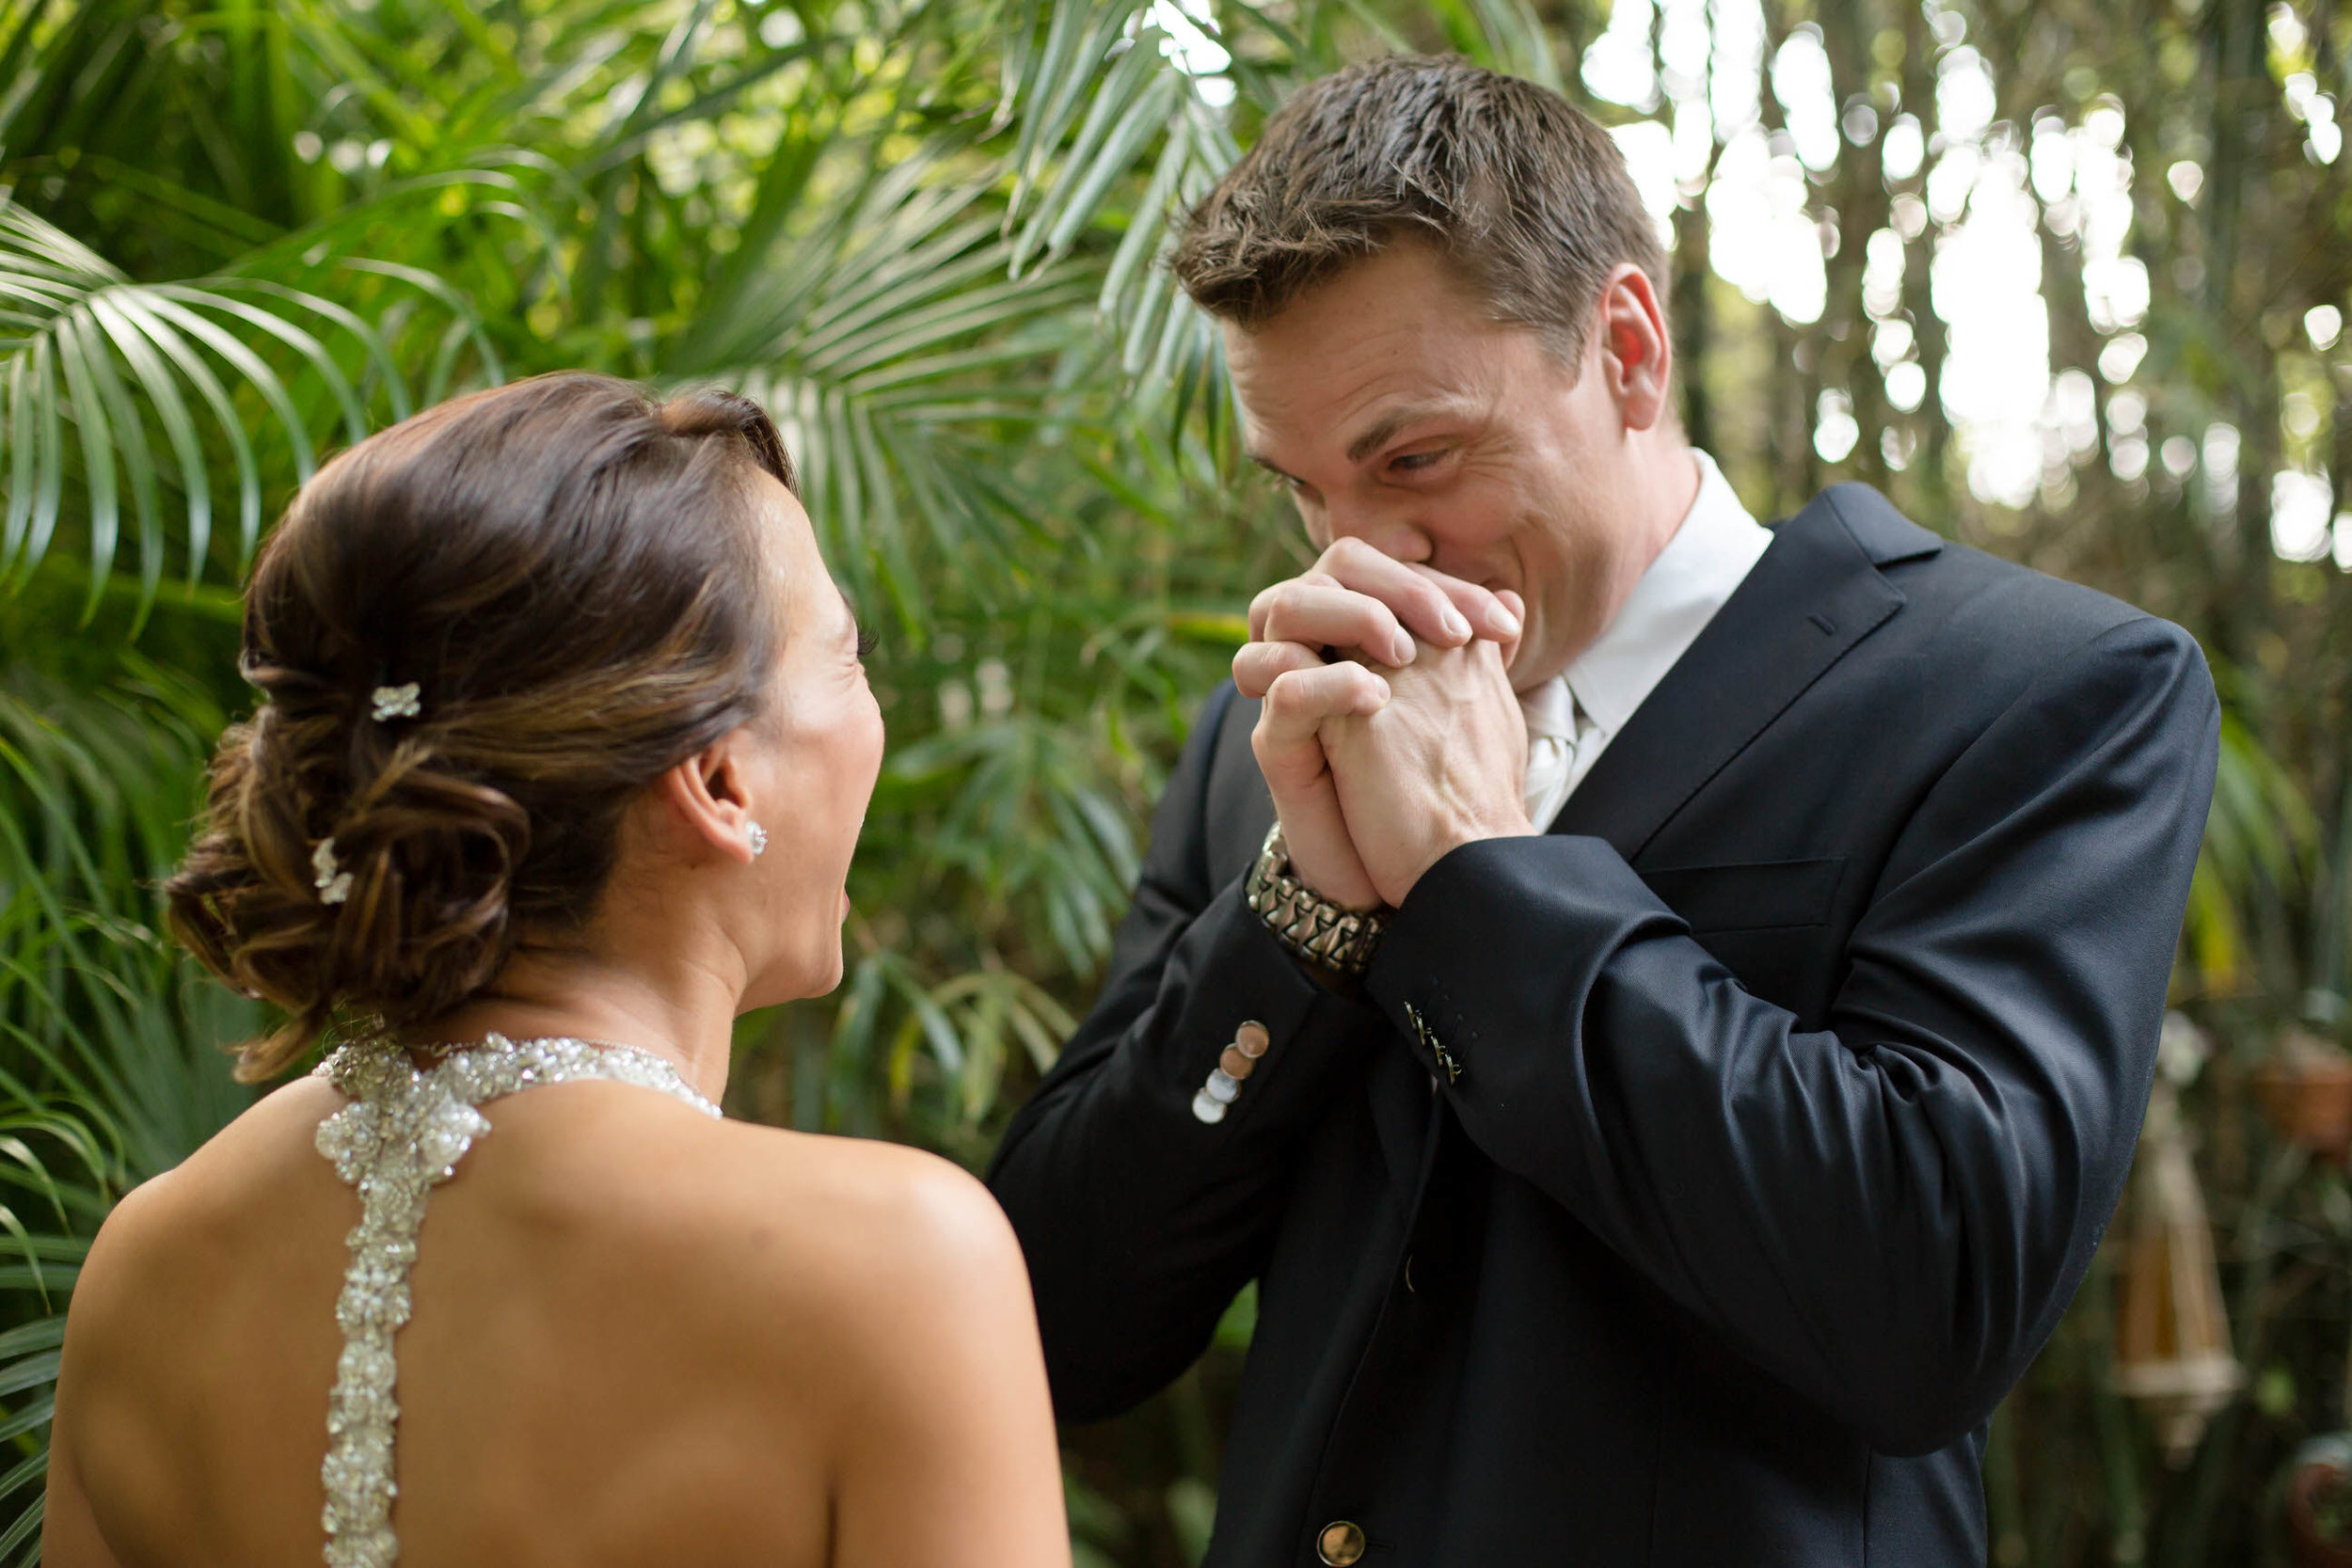 groom_first_look_bride_tiny_house_hoto.jpg